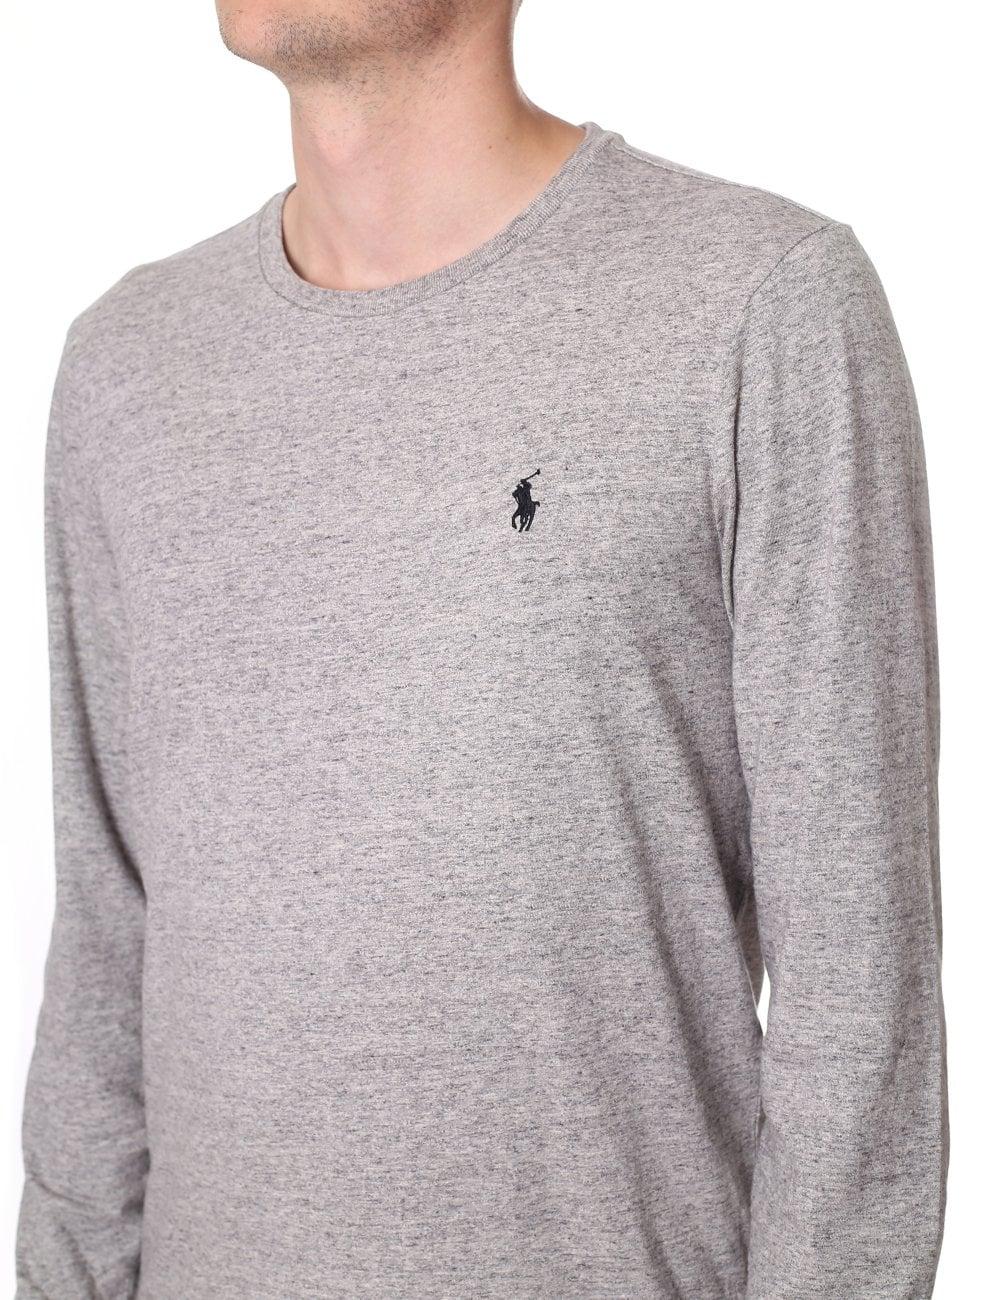 d0719e6ba Long Sleeve Shirts Polo Ralph Lauren – EDGE Engineering and ...